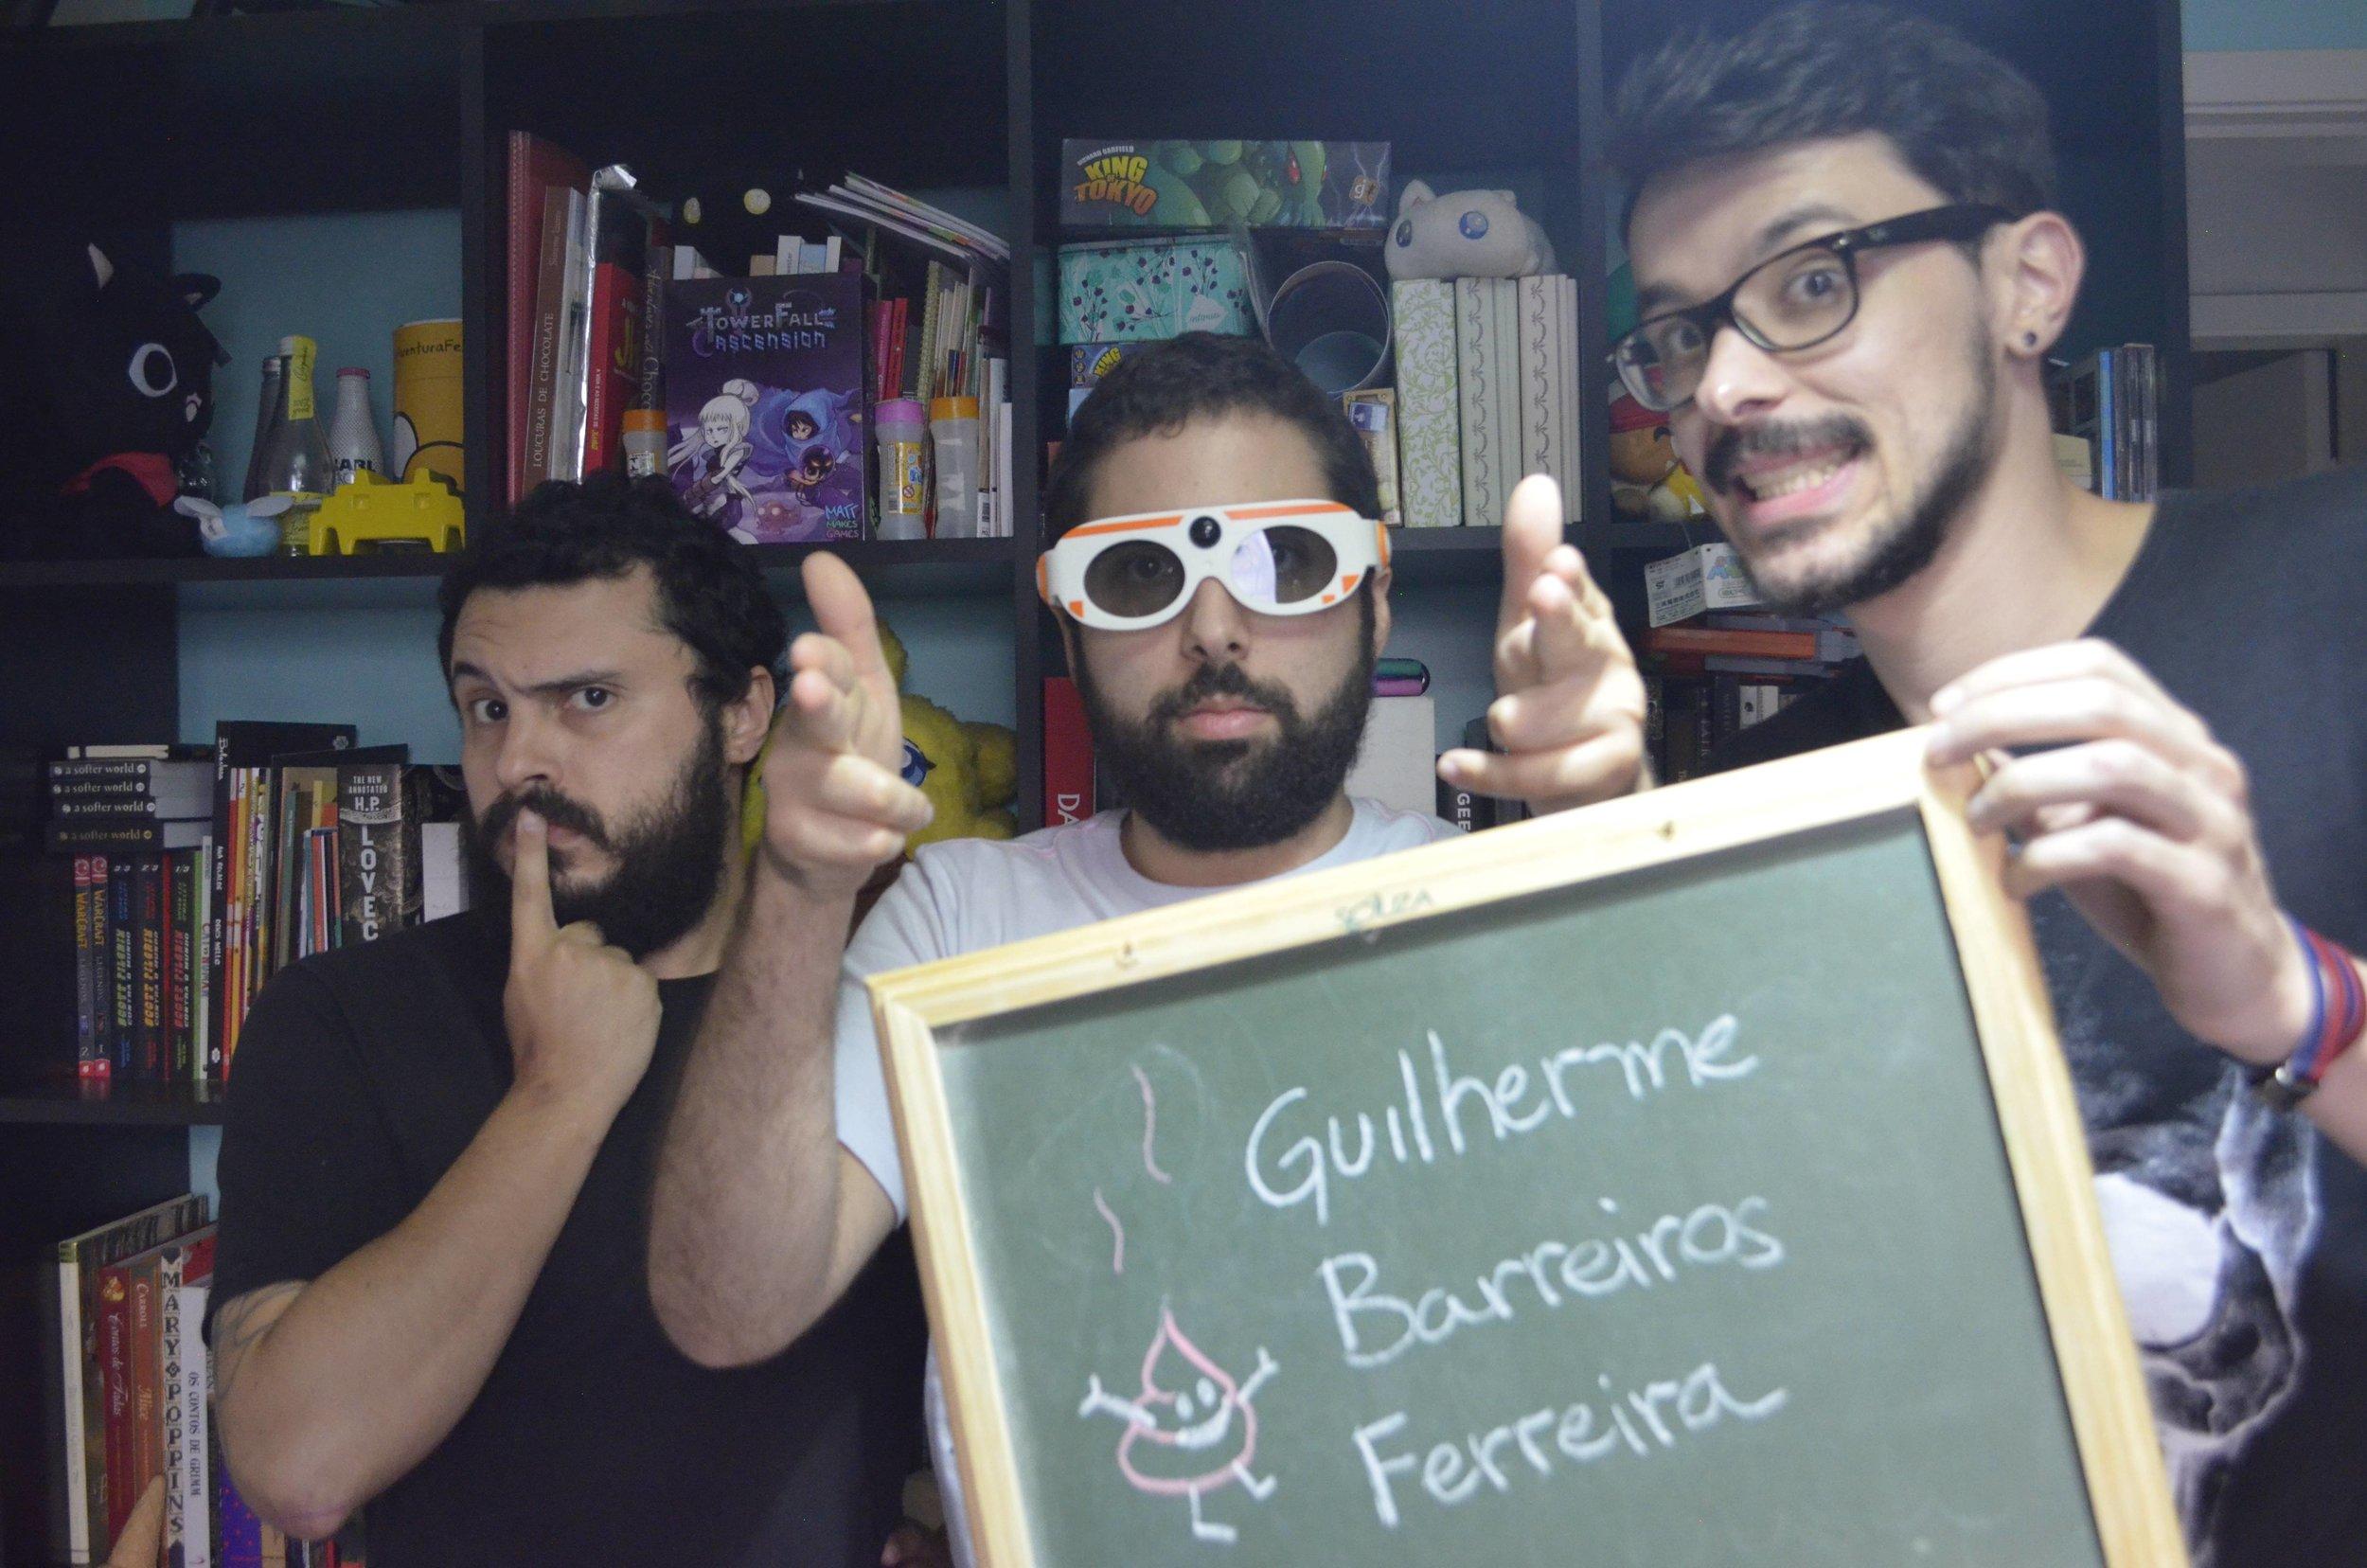 Guilherme-Barreiros.jpg